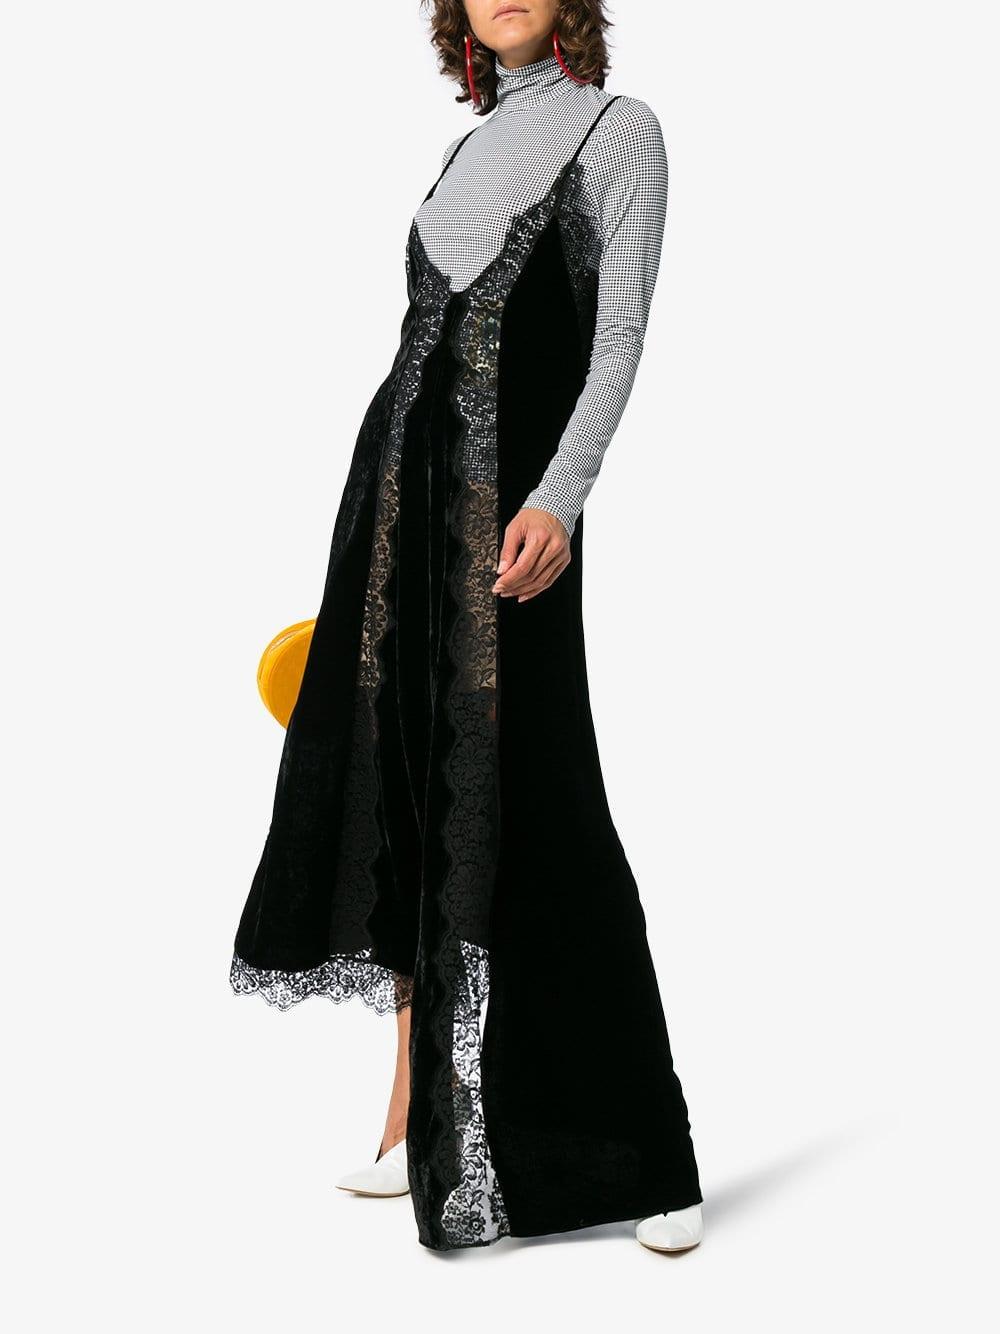 STELLA MCCARTNEY Lace Slip Silk Black Dress - We Select Dresses